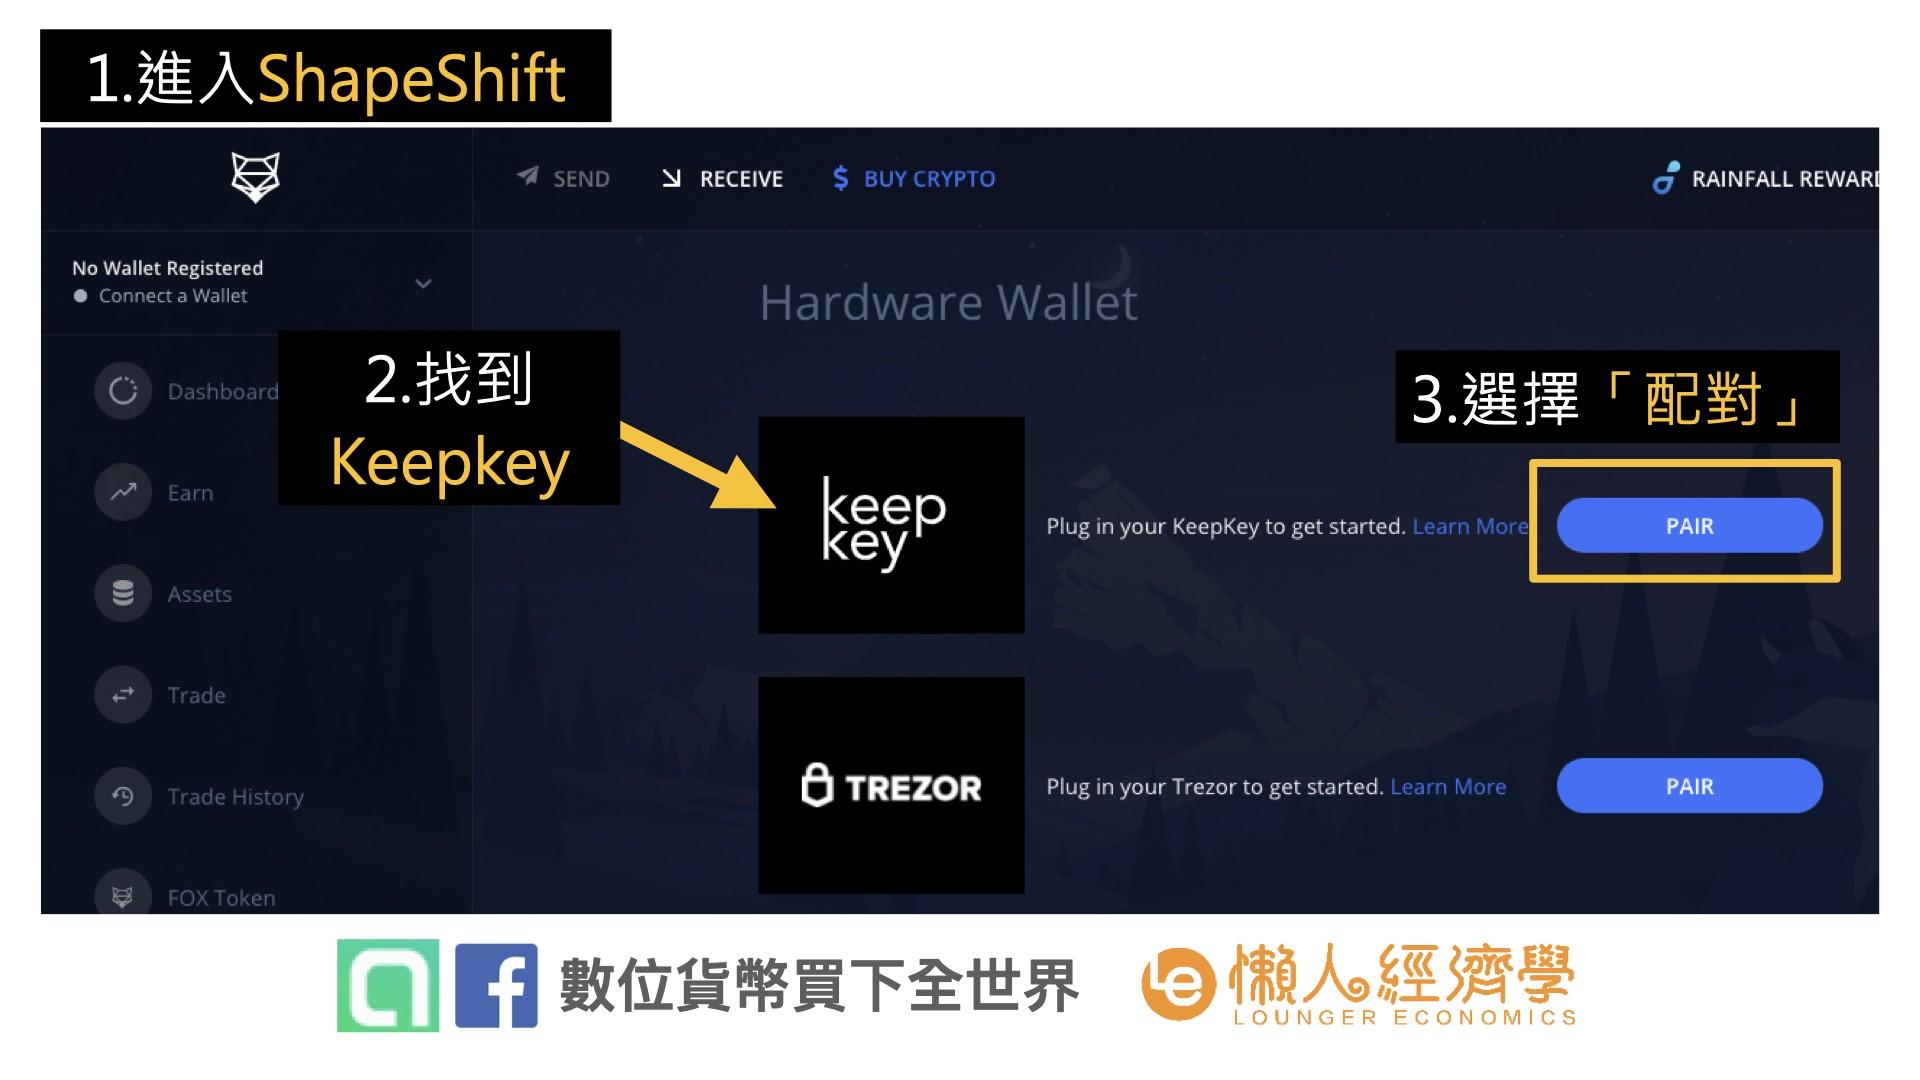 如何設定你的 KeepKey Wallet:進入ShapeShift官網